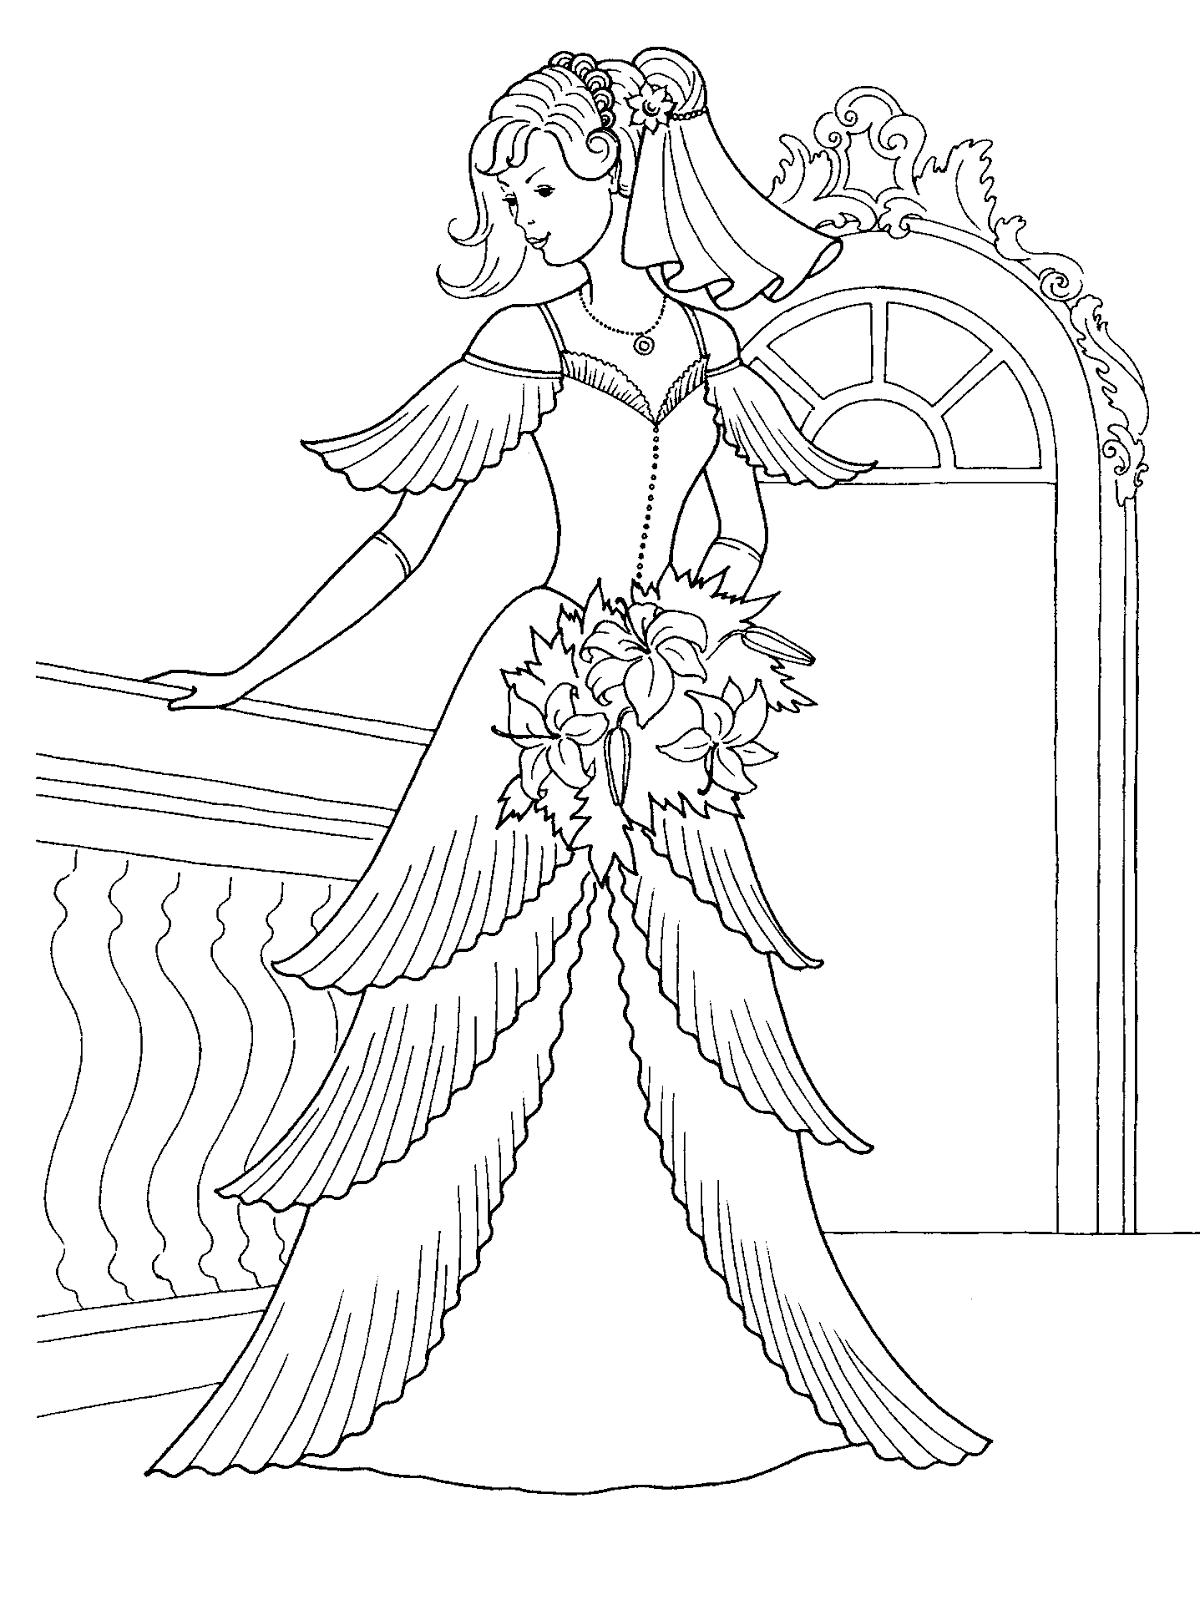 Disney Movie Princesses: Princess Coloring Pages